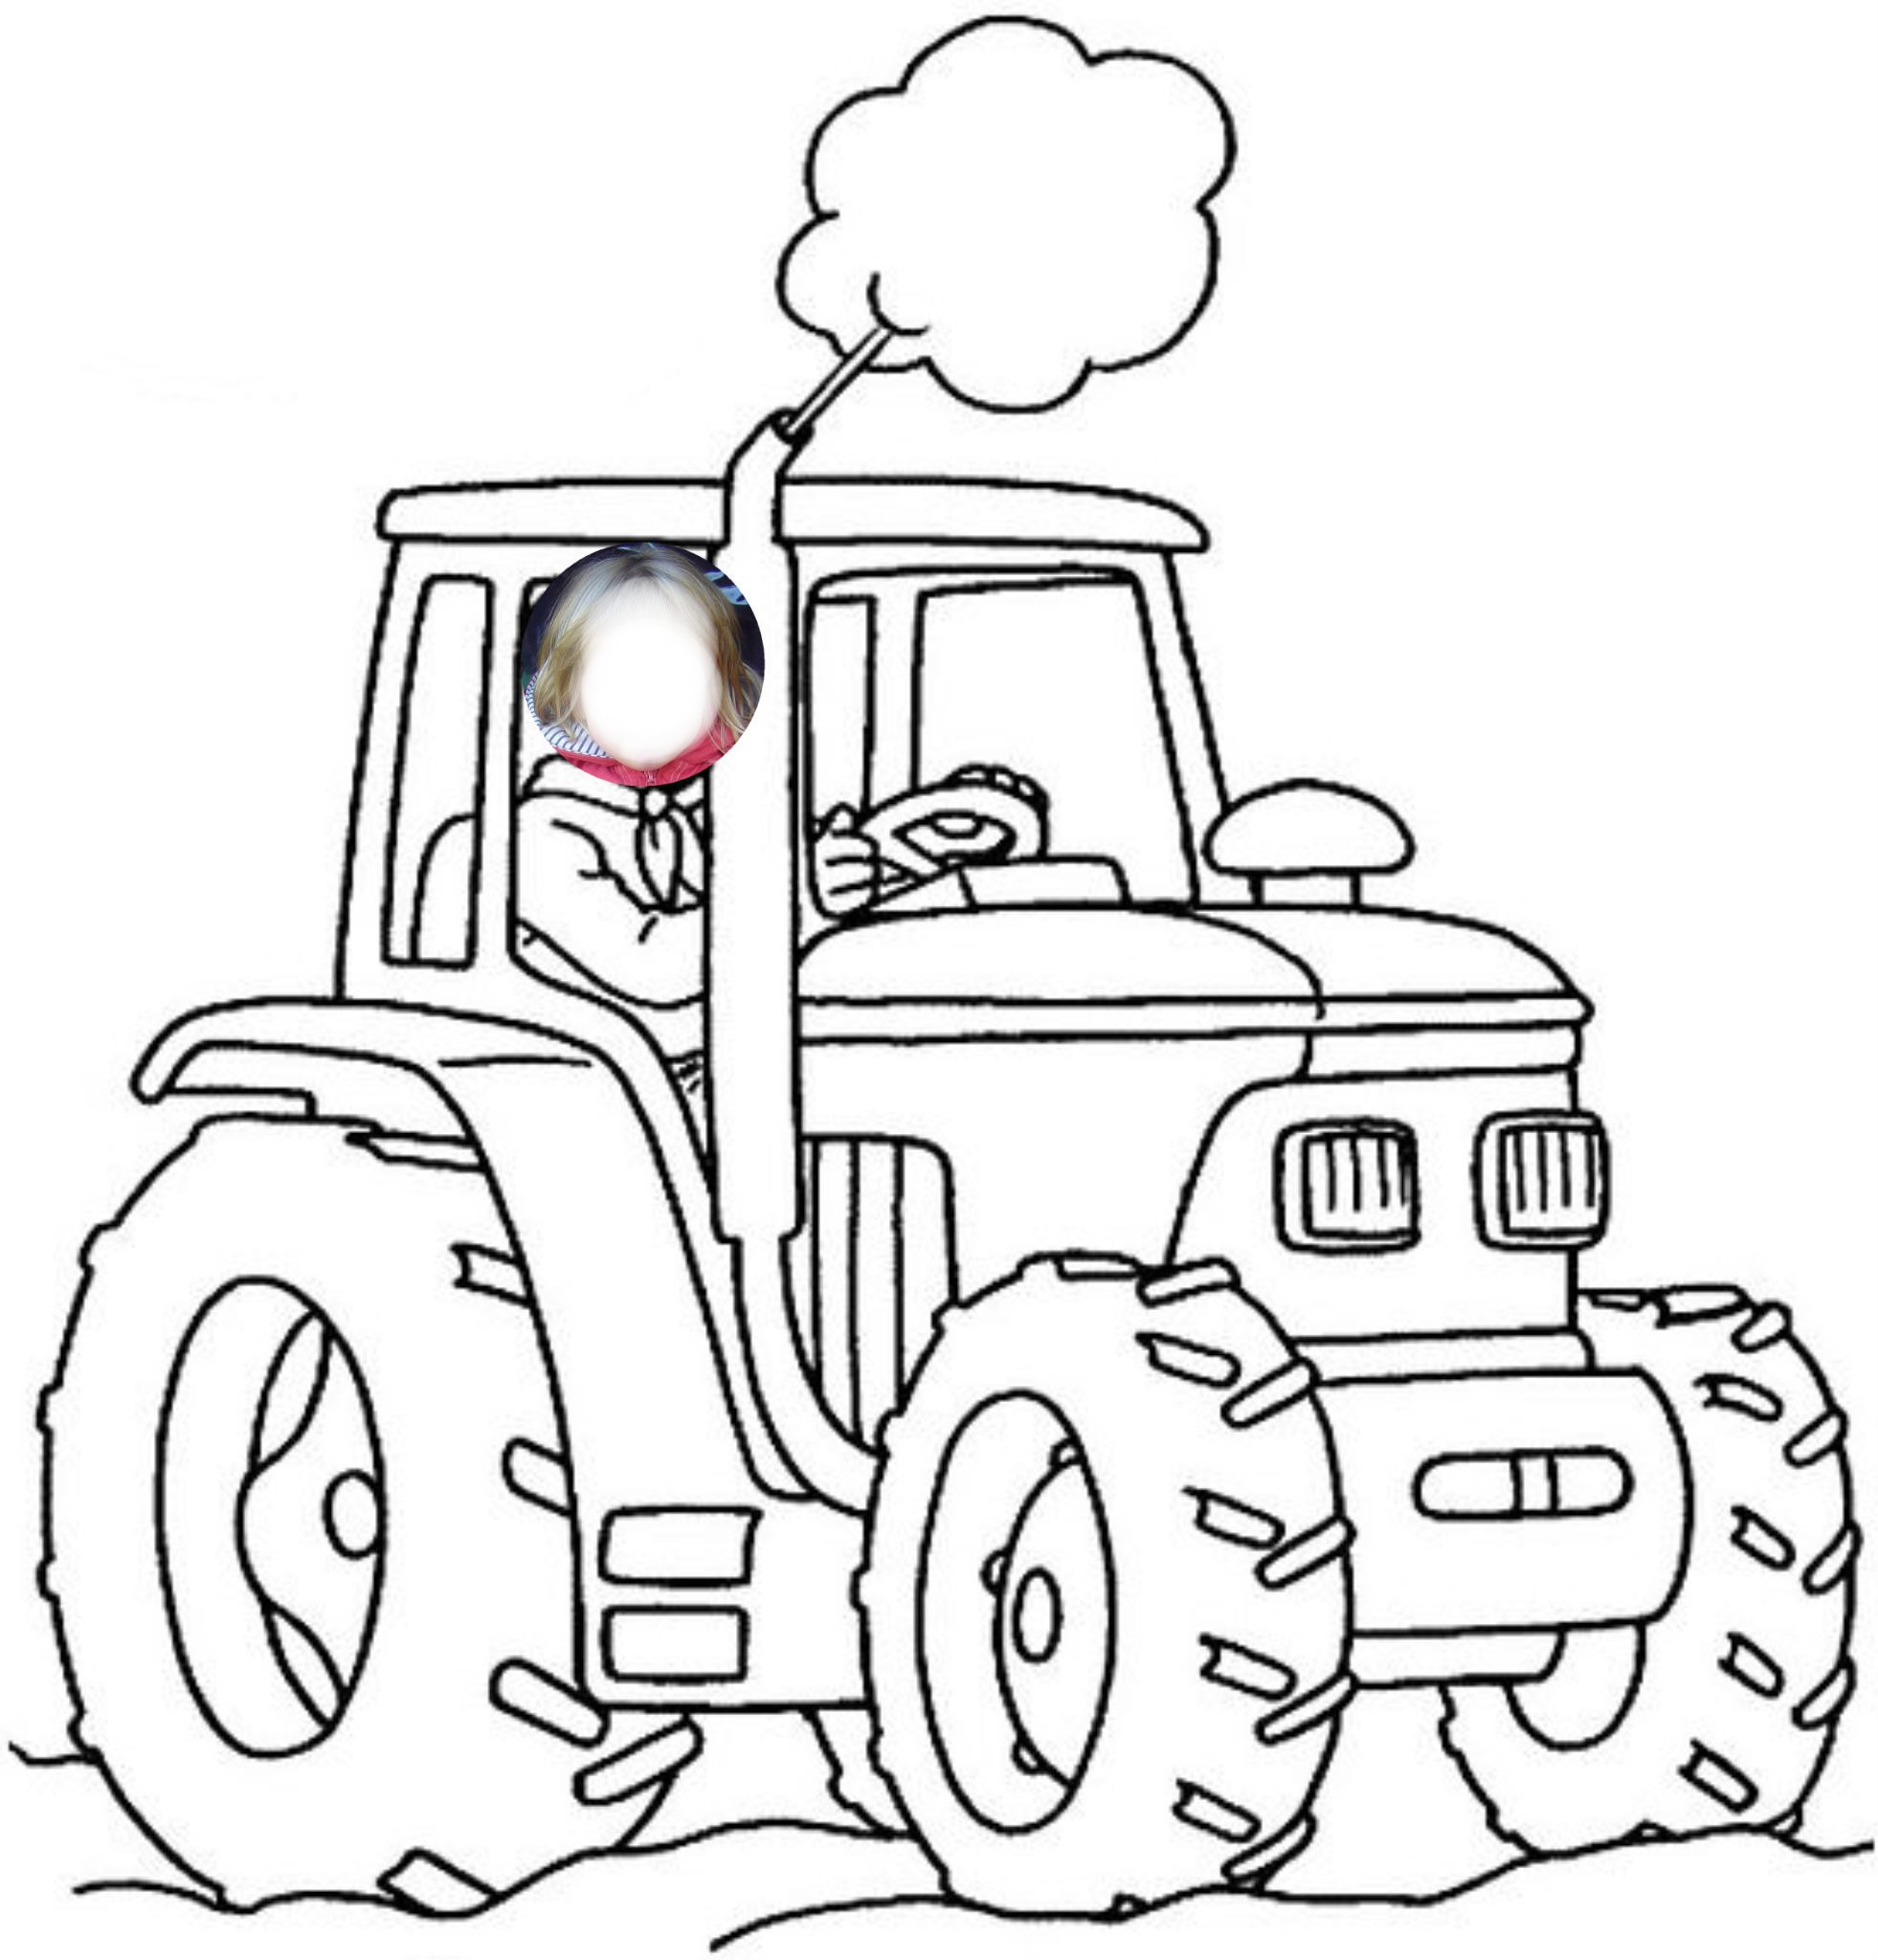 Coloriage Hugo Lescargot Tracteur.Luxe Hugo L Escargot Coloriage Tracteur Des Milliers De Coloriage